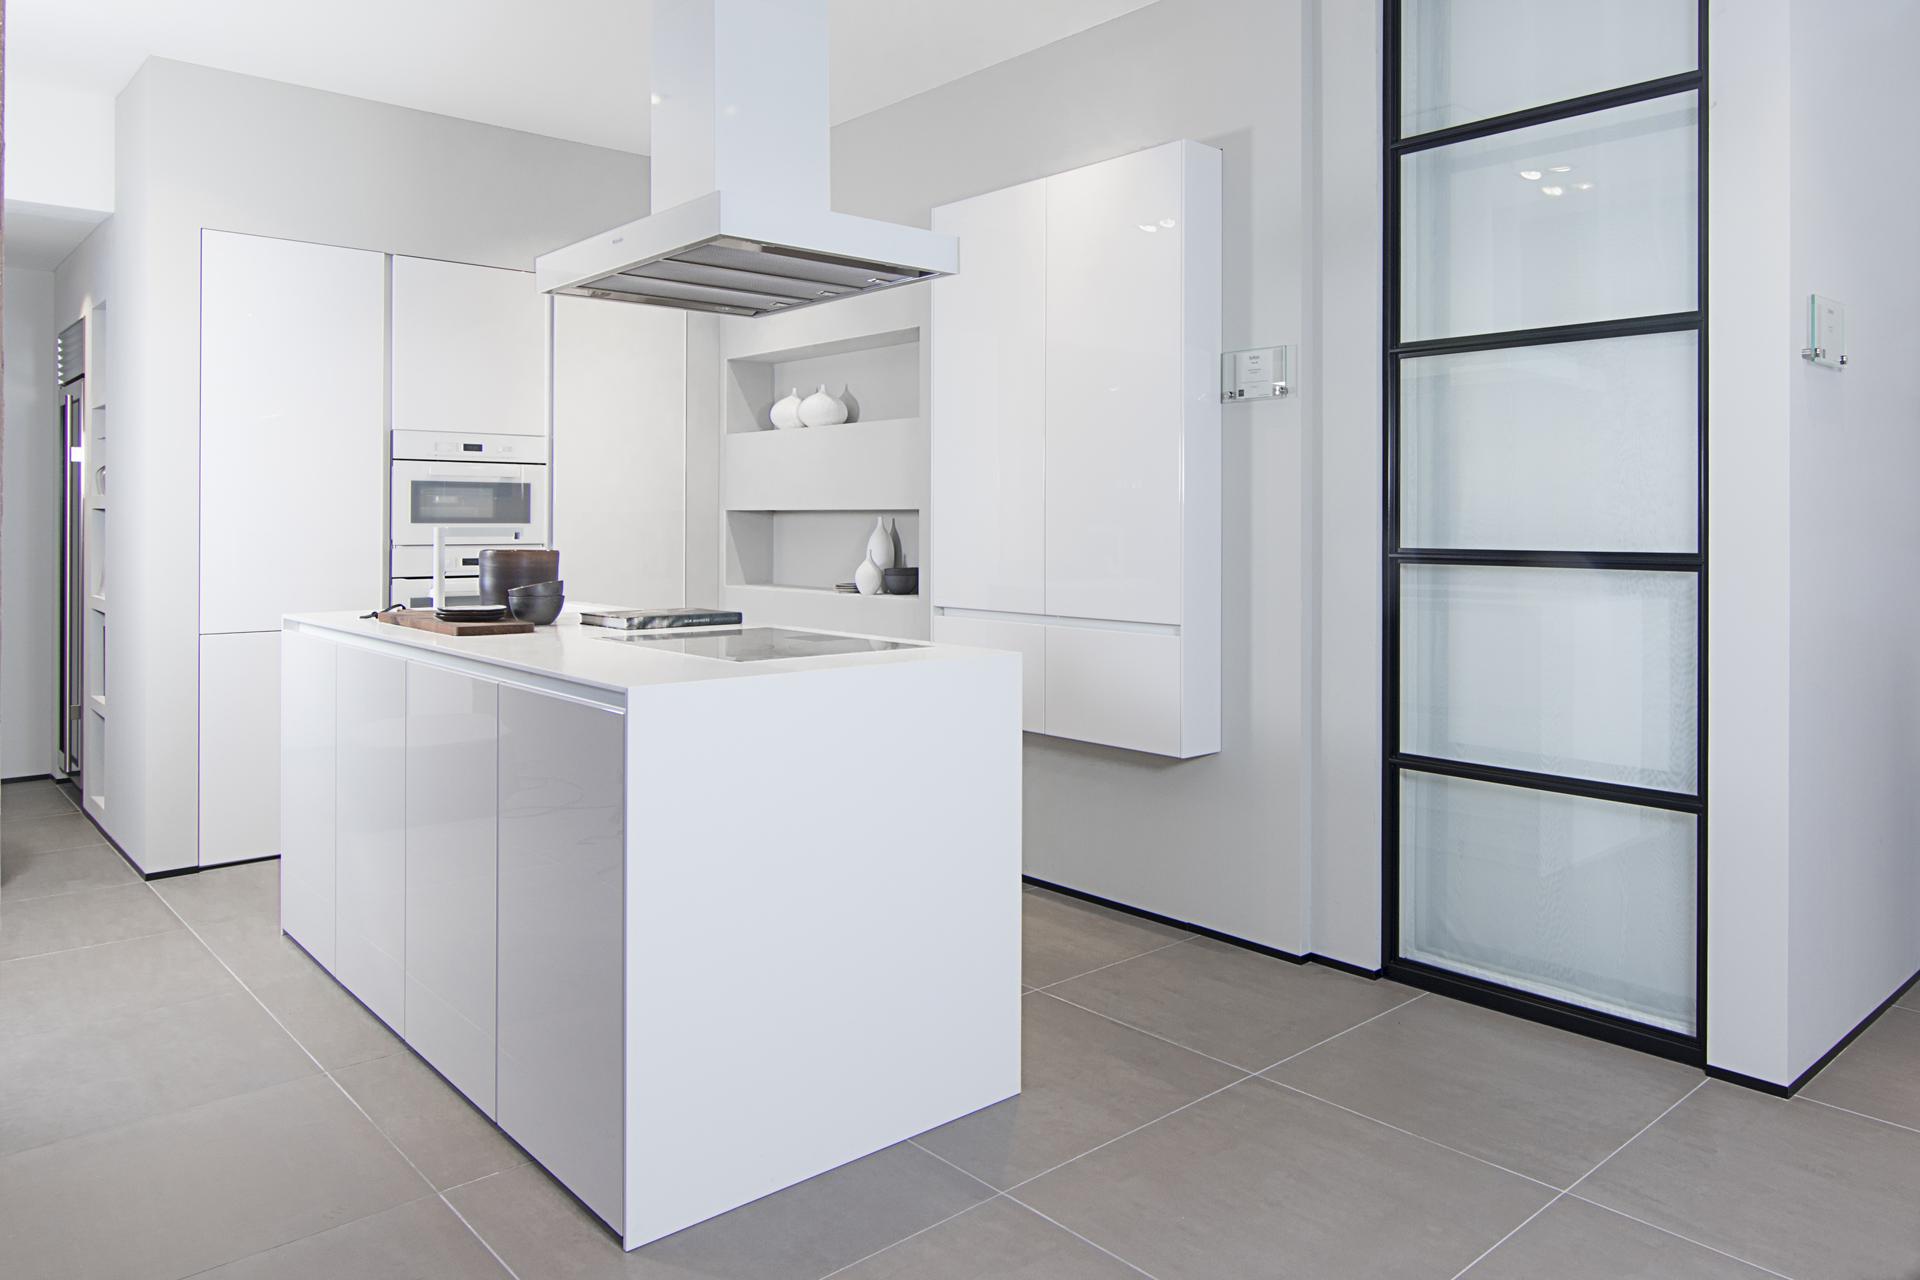 SieMatic witte hoogglans keuken met corian blad, Showroom keuken ASWA Keukens